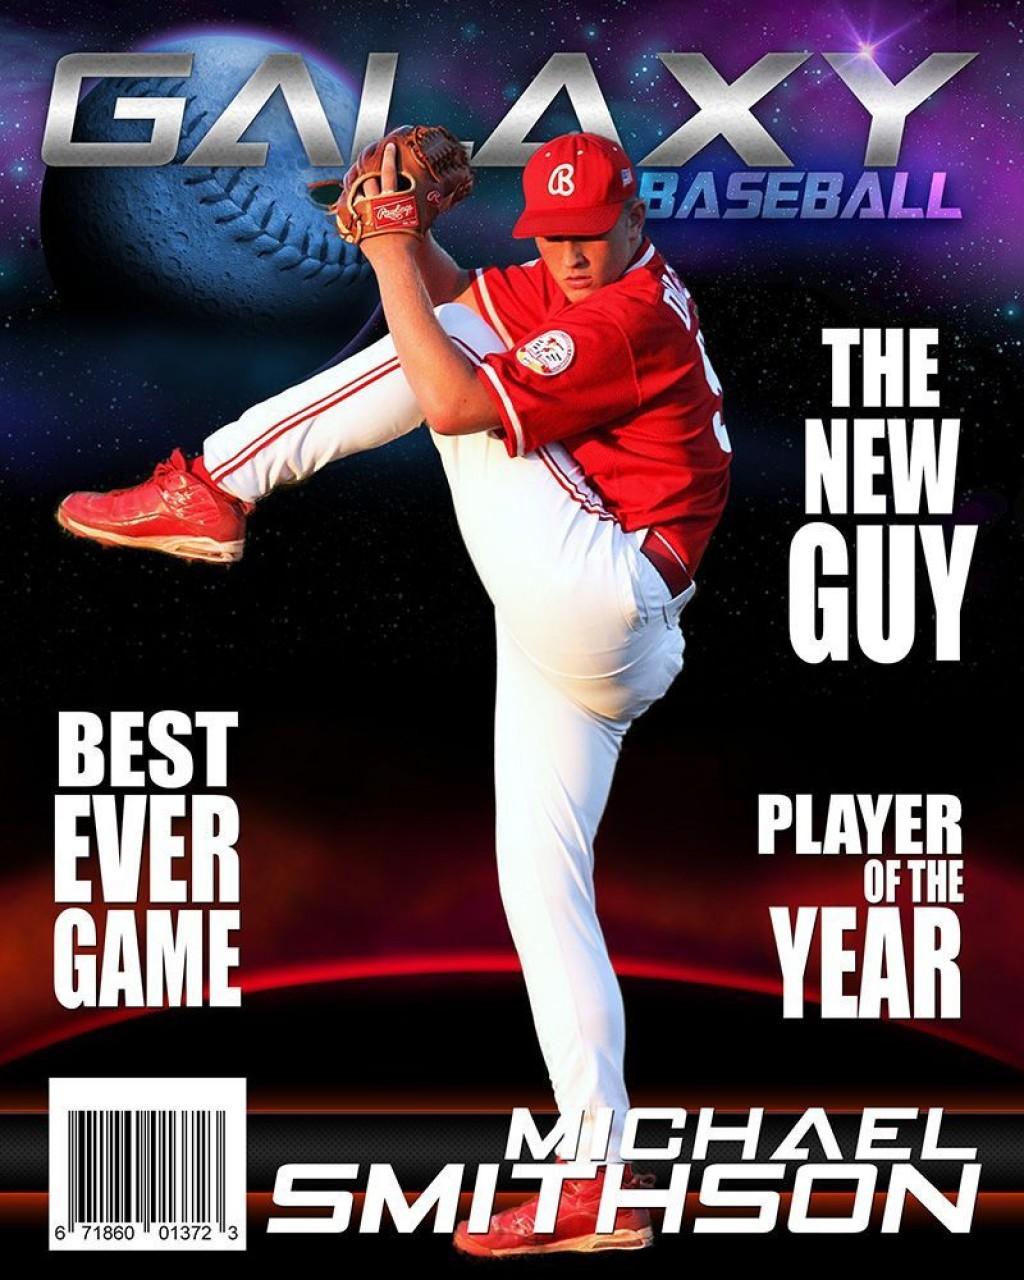 002 Astounding Photoshop Baseball Magazine Cover Template Concept Large